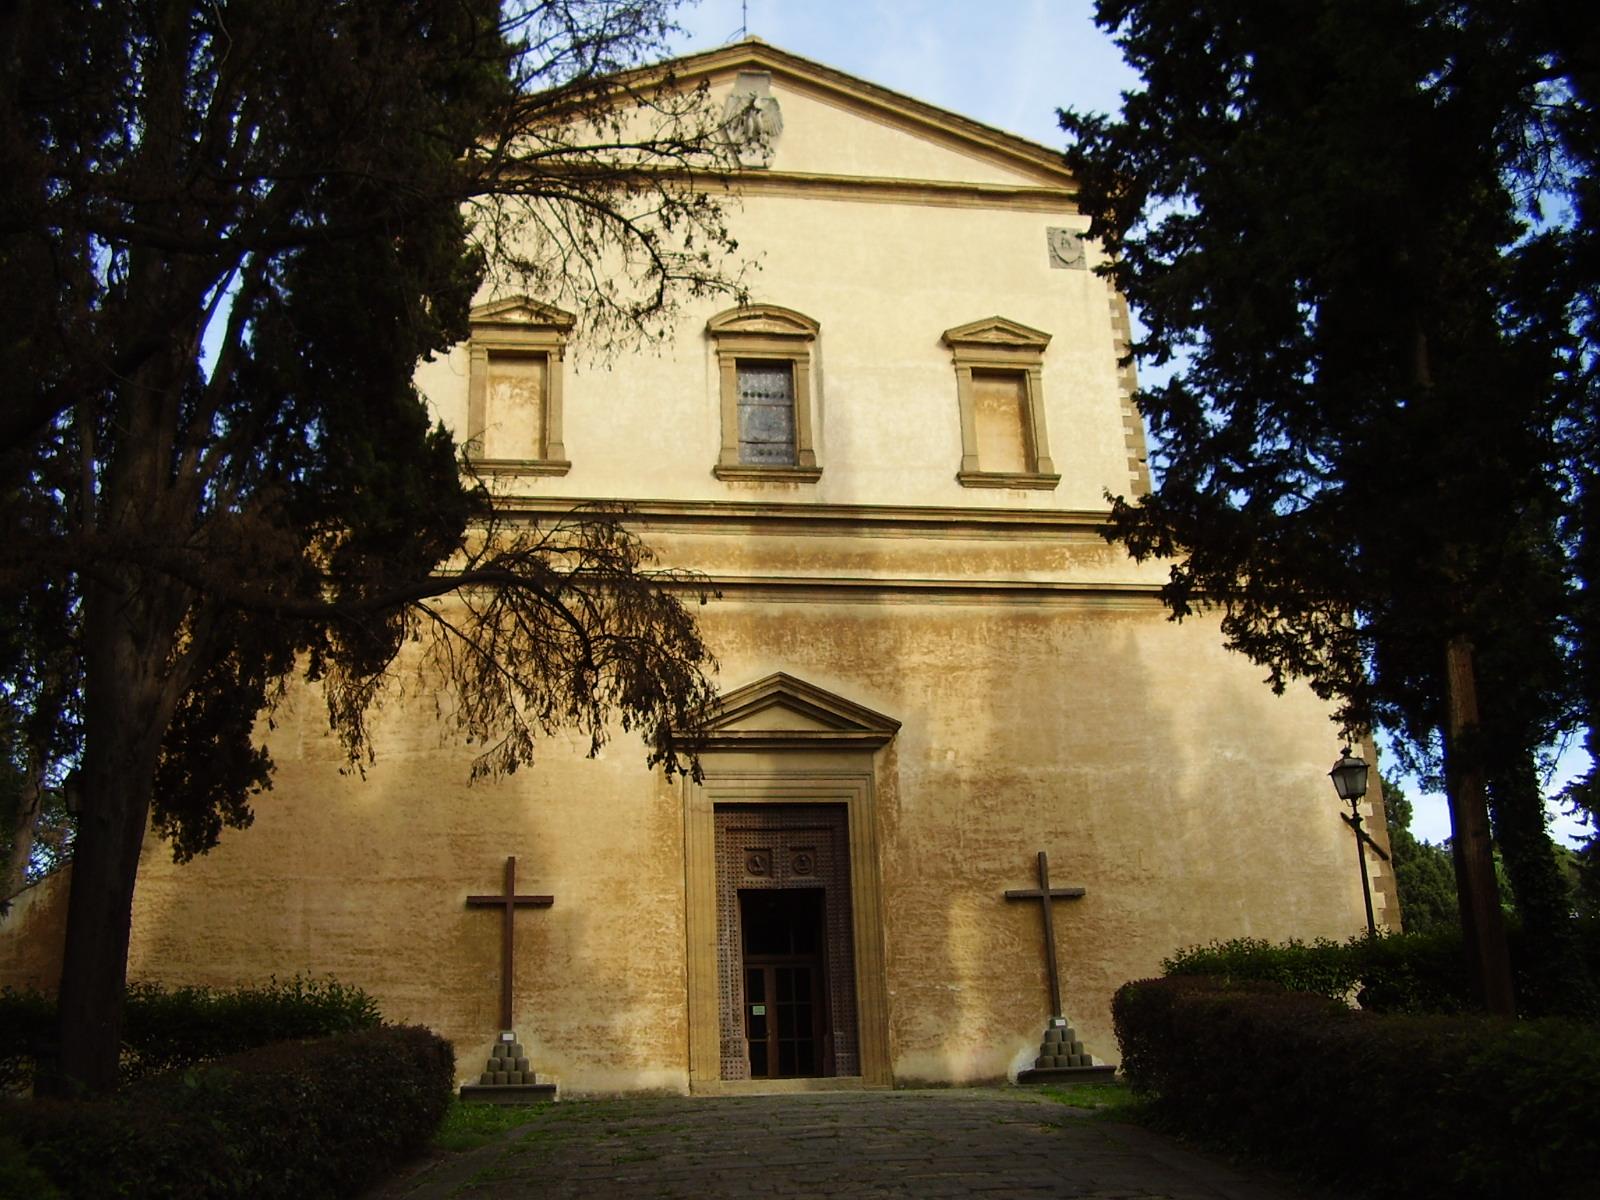 San Salvatore al Monte, Firenze